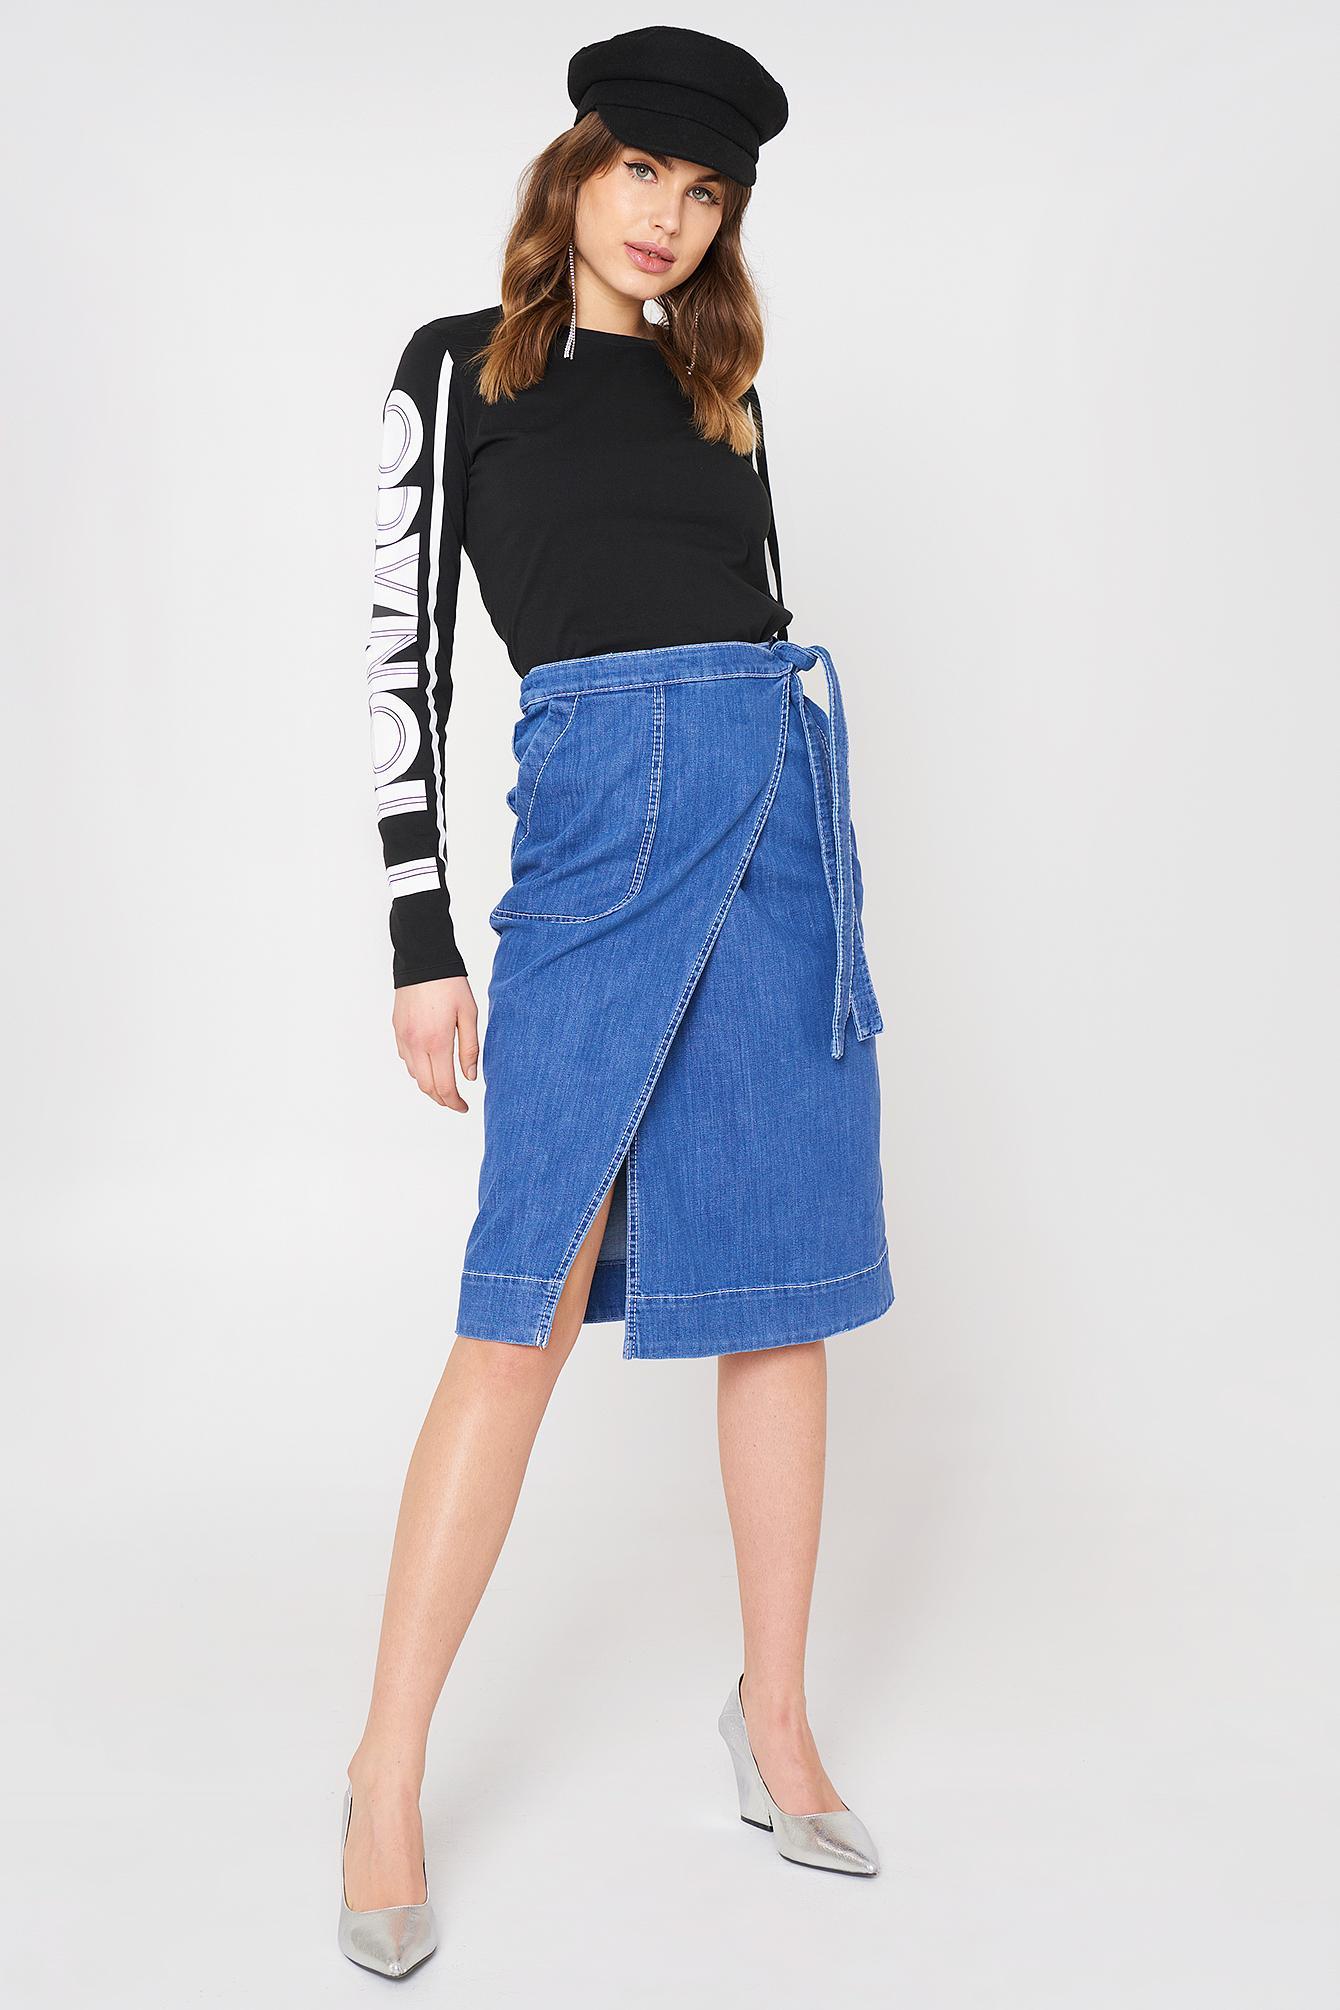 Tommy Hilfiger Lylyan Skirt Blue